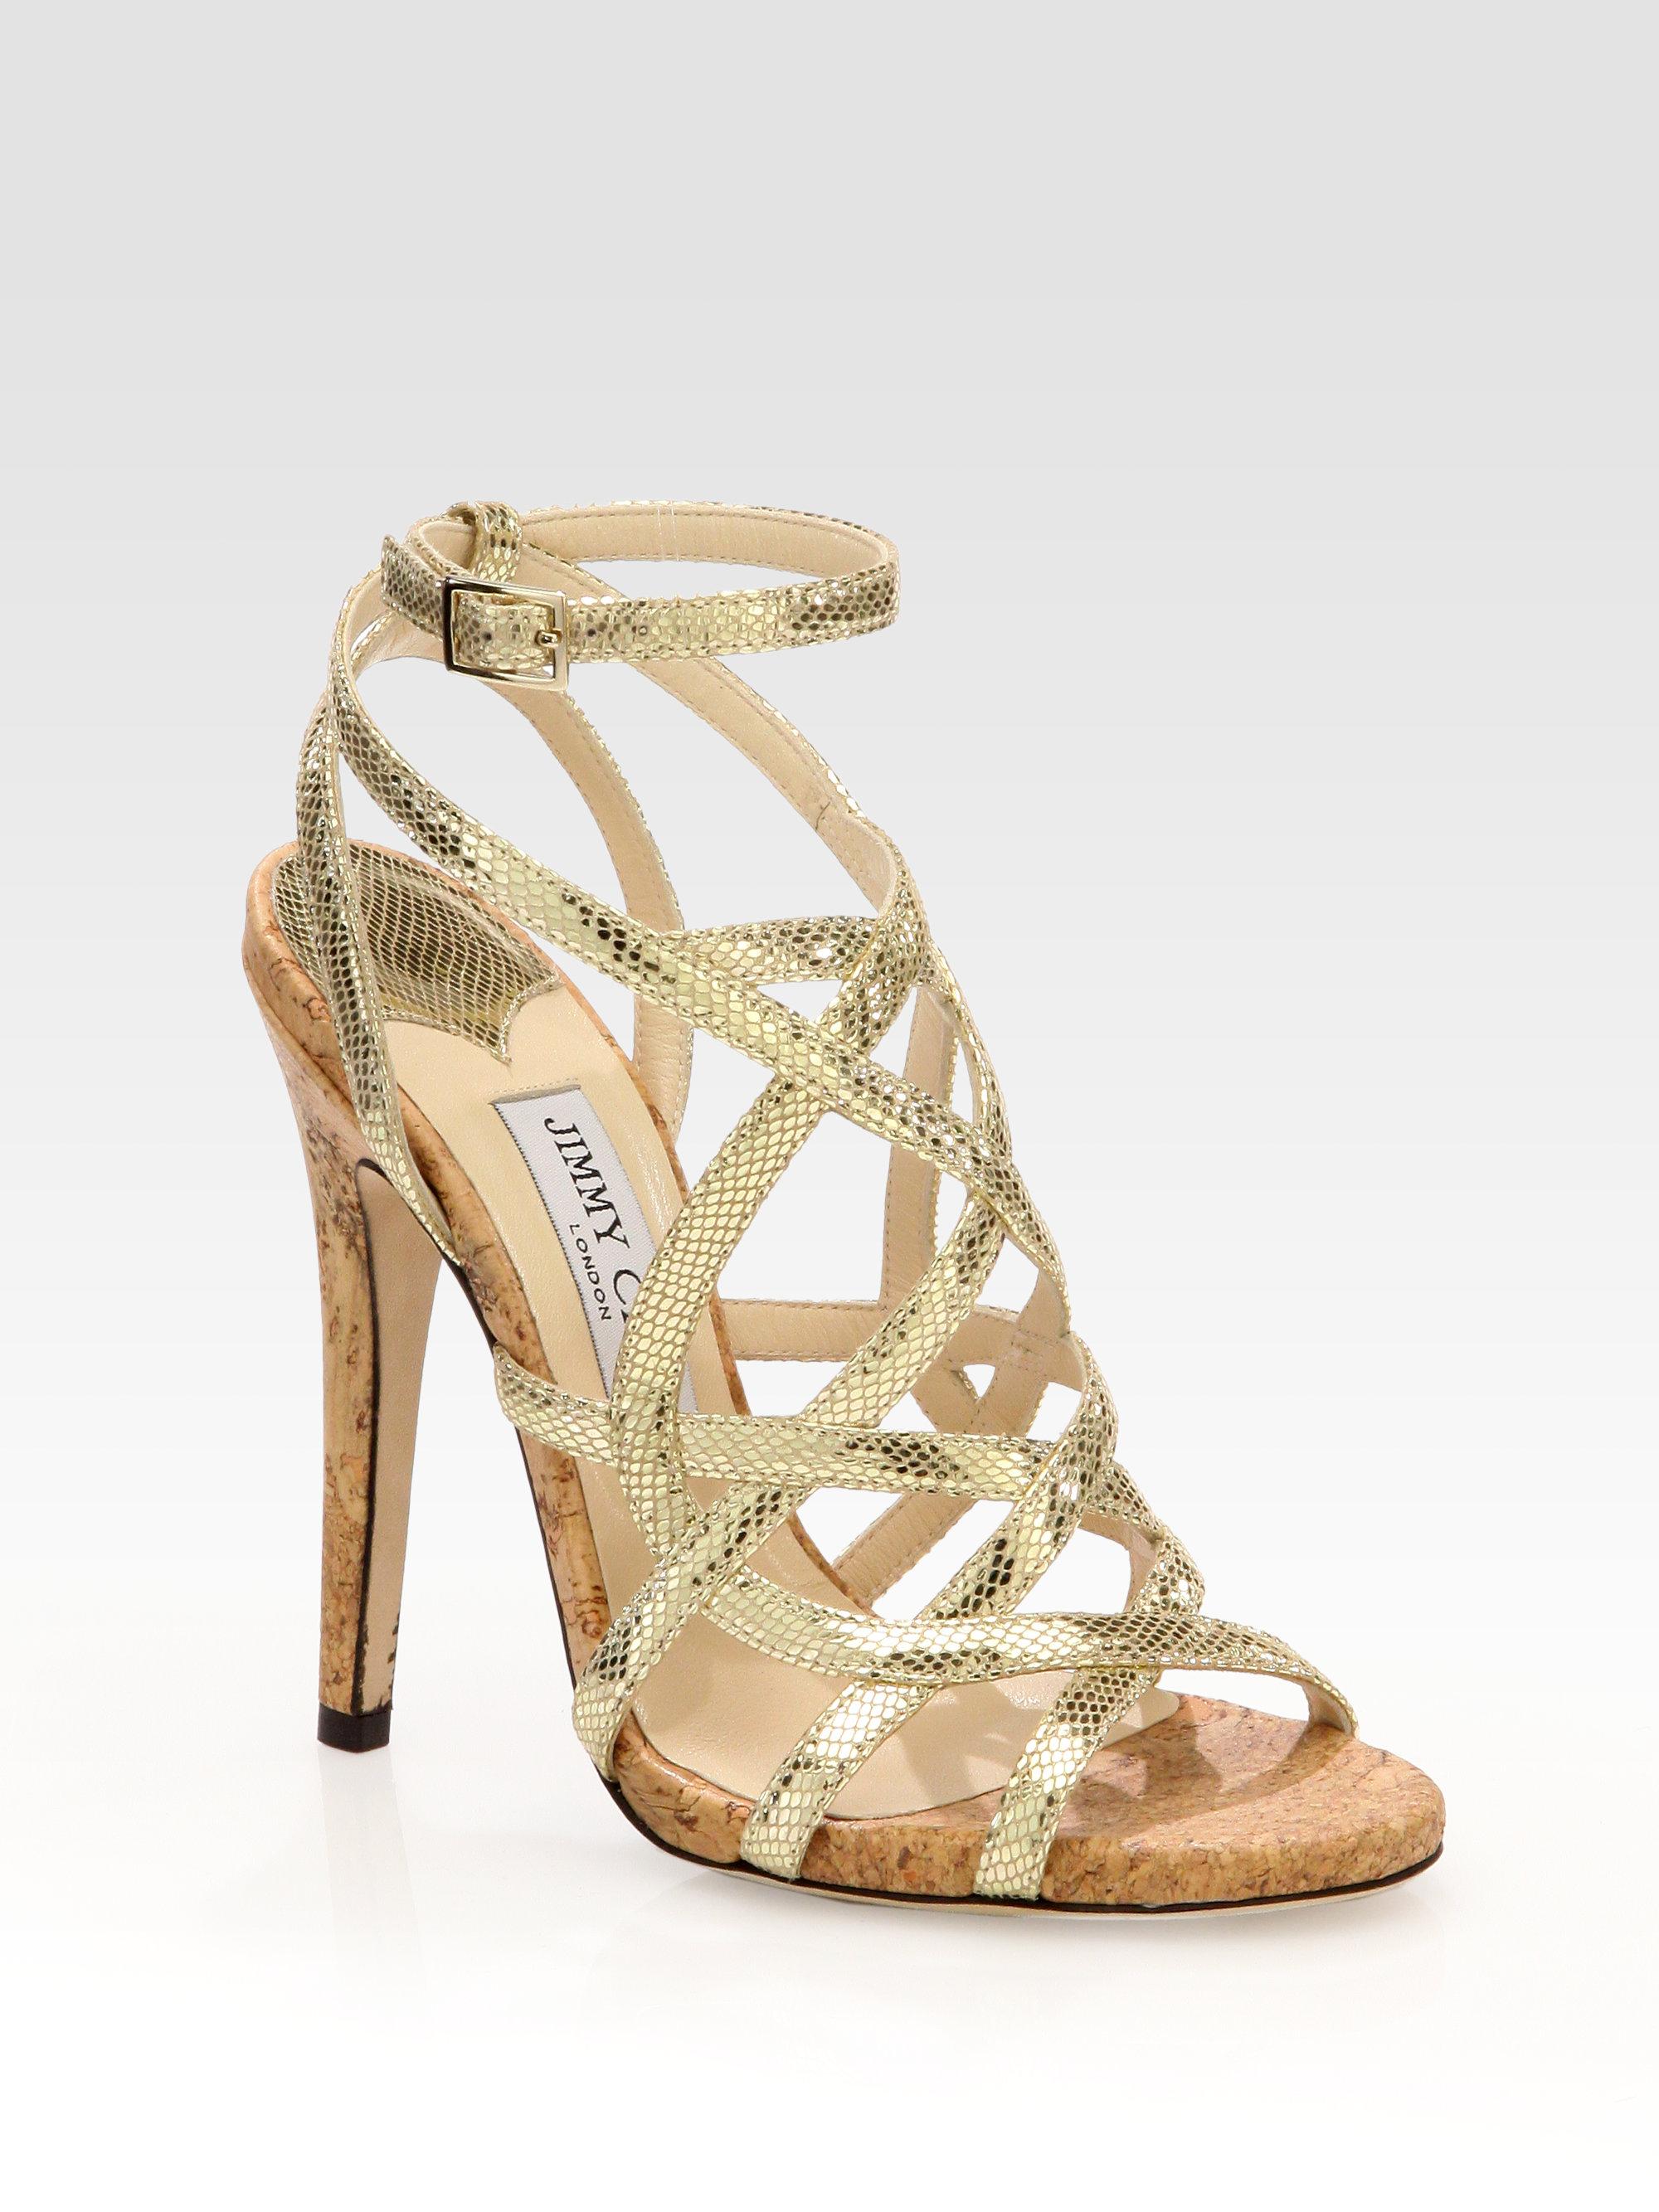 Jimmy Choo Dehlia Metallic Leather Cork Heel Sandals In